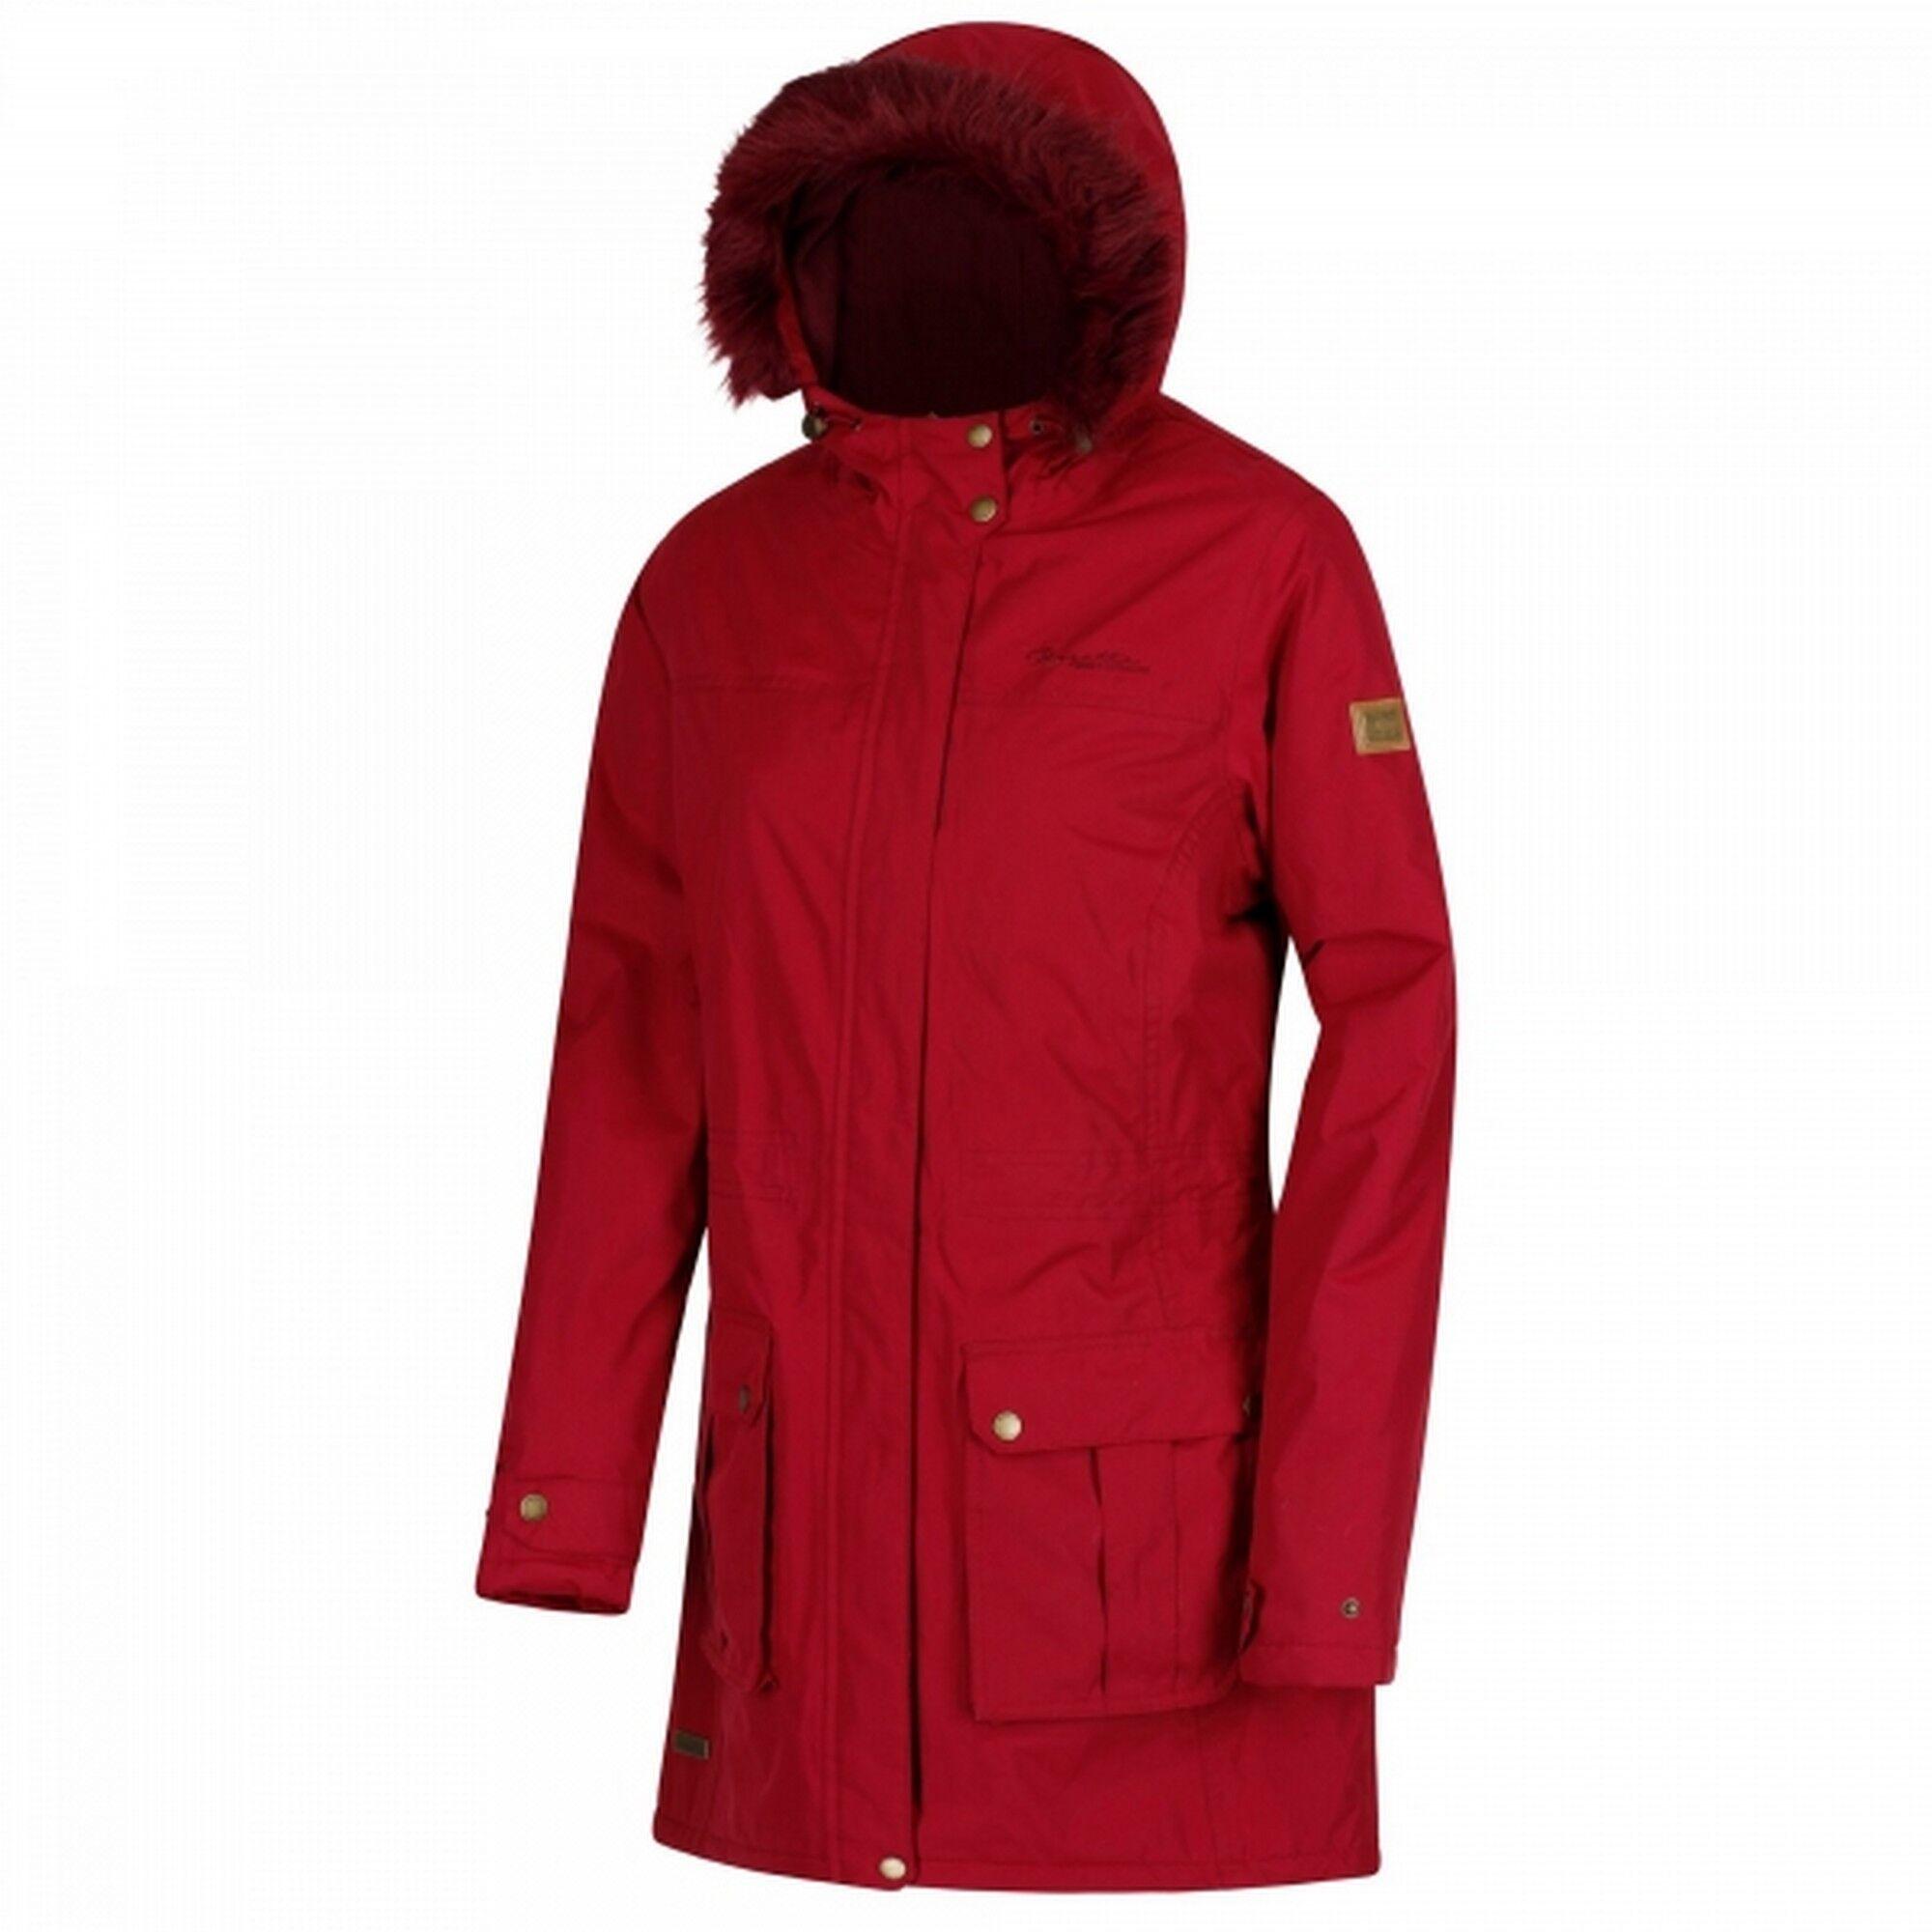 Regatta - Manteau Imperméable Sherlyn - Femme (Rouge) - UTRG3725